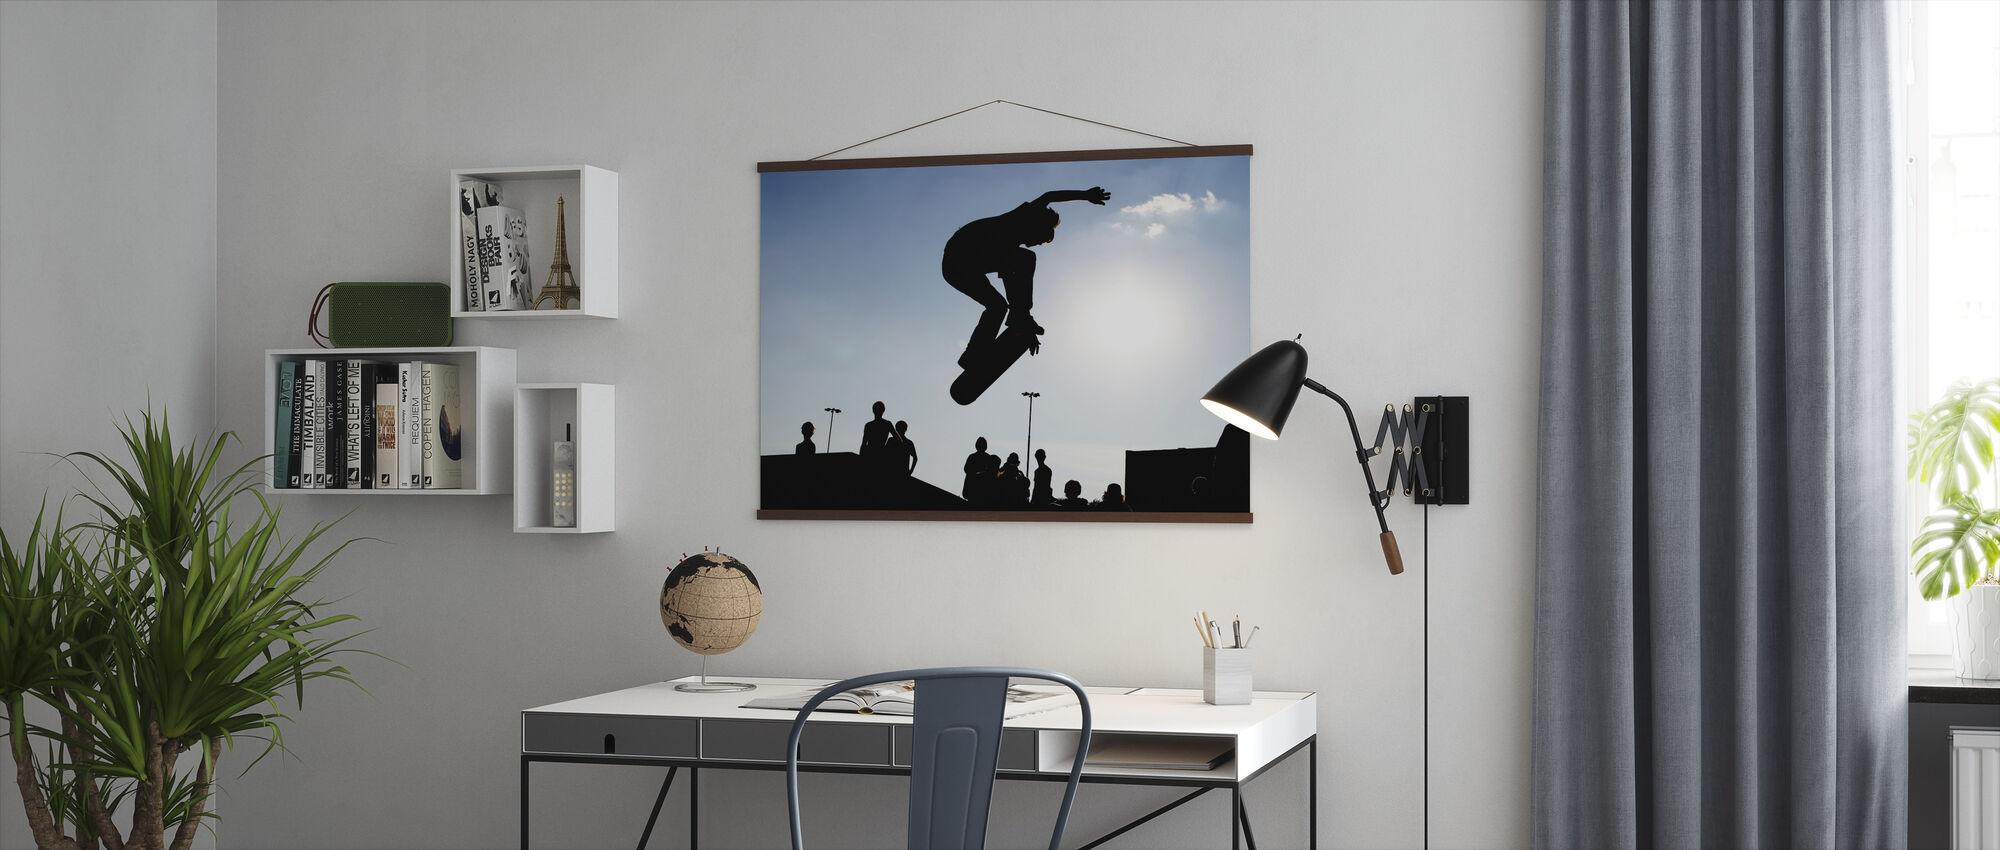 Skateboard Jump - Poster - Office